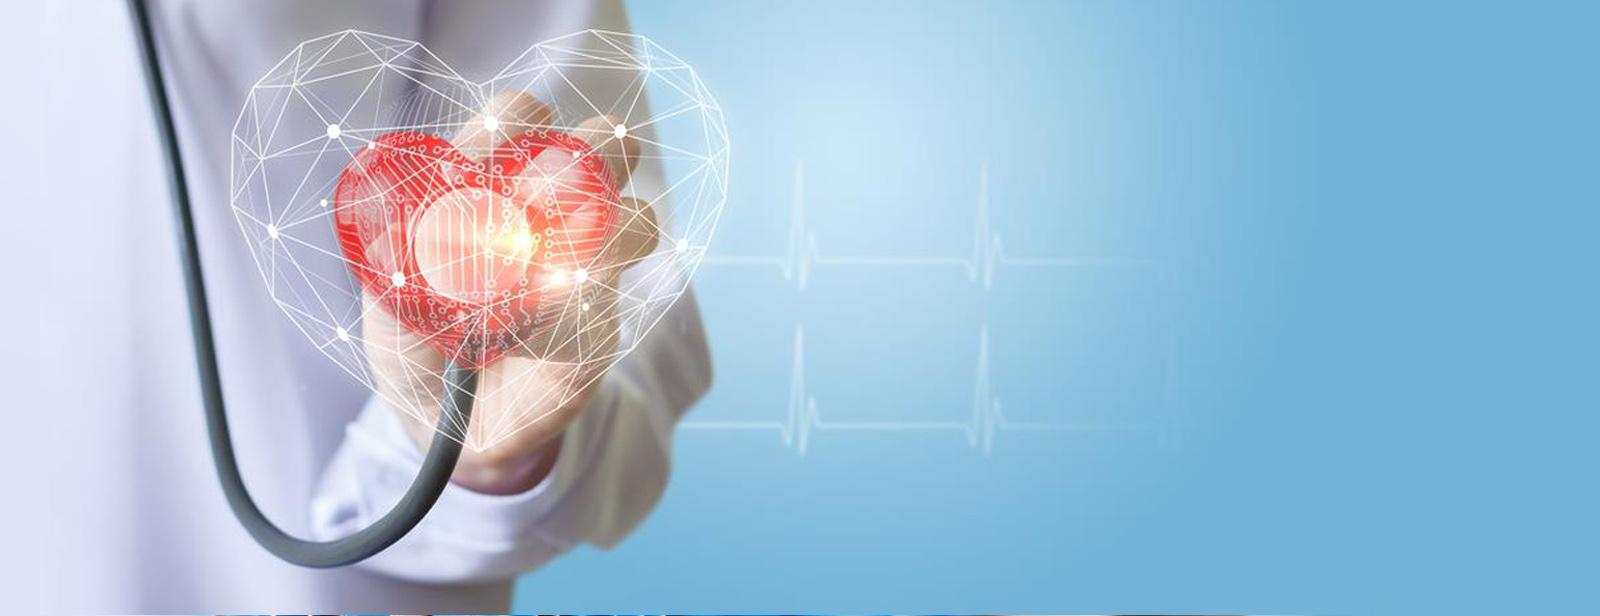 Herz-Pflege-Tipp